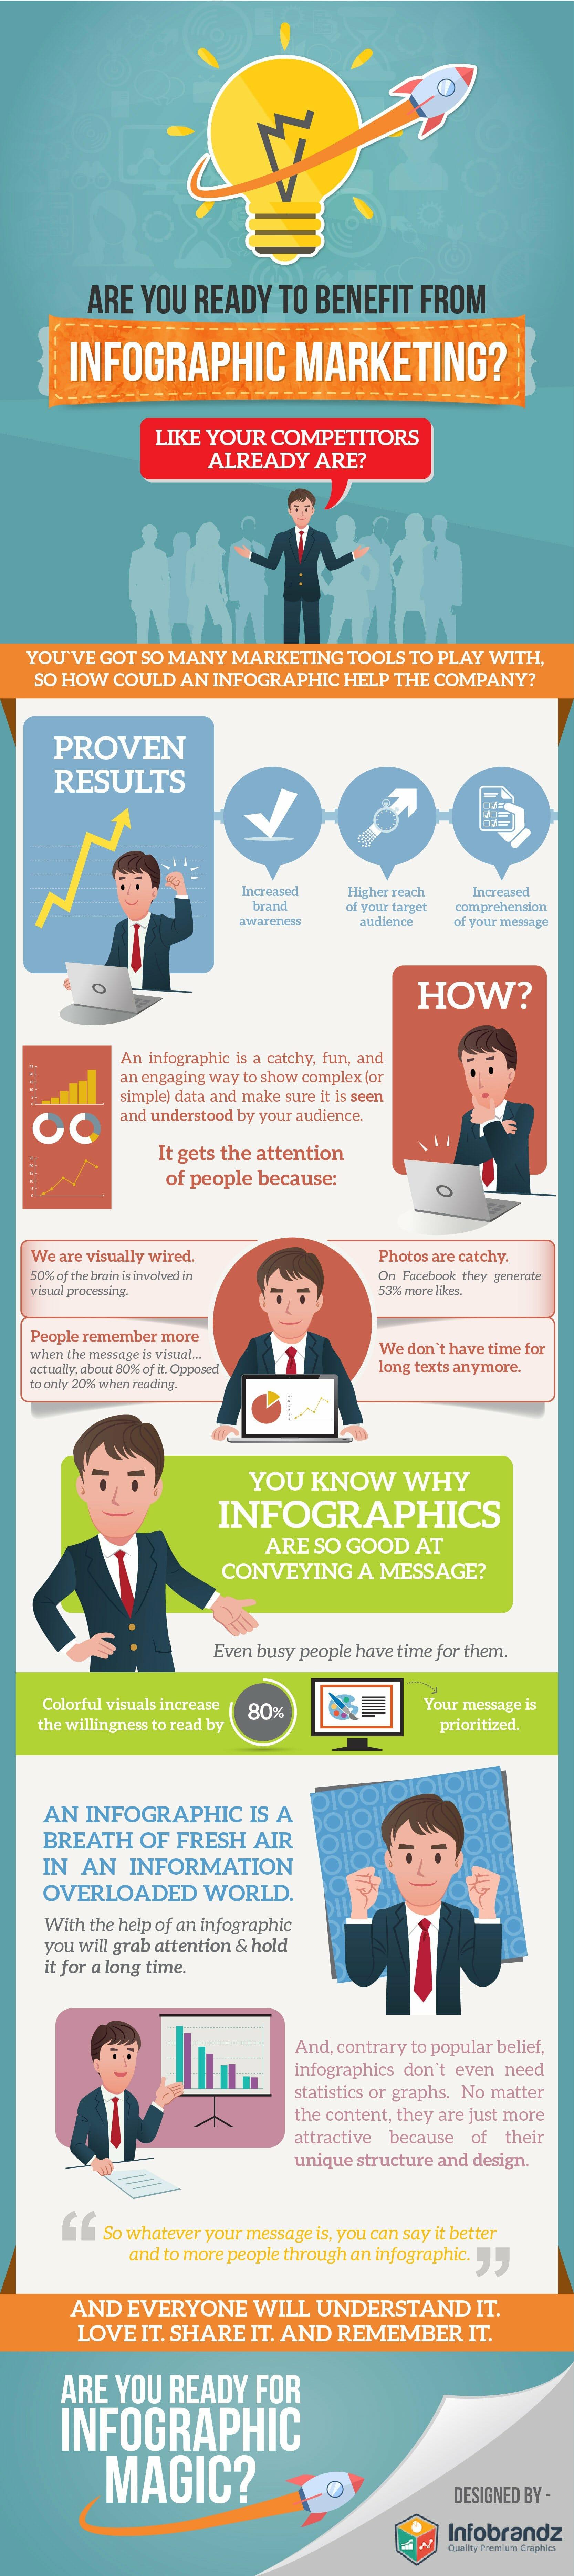 infographic marketing,infographic design agency,content marketing design agency